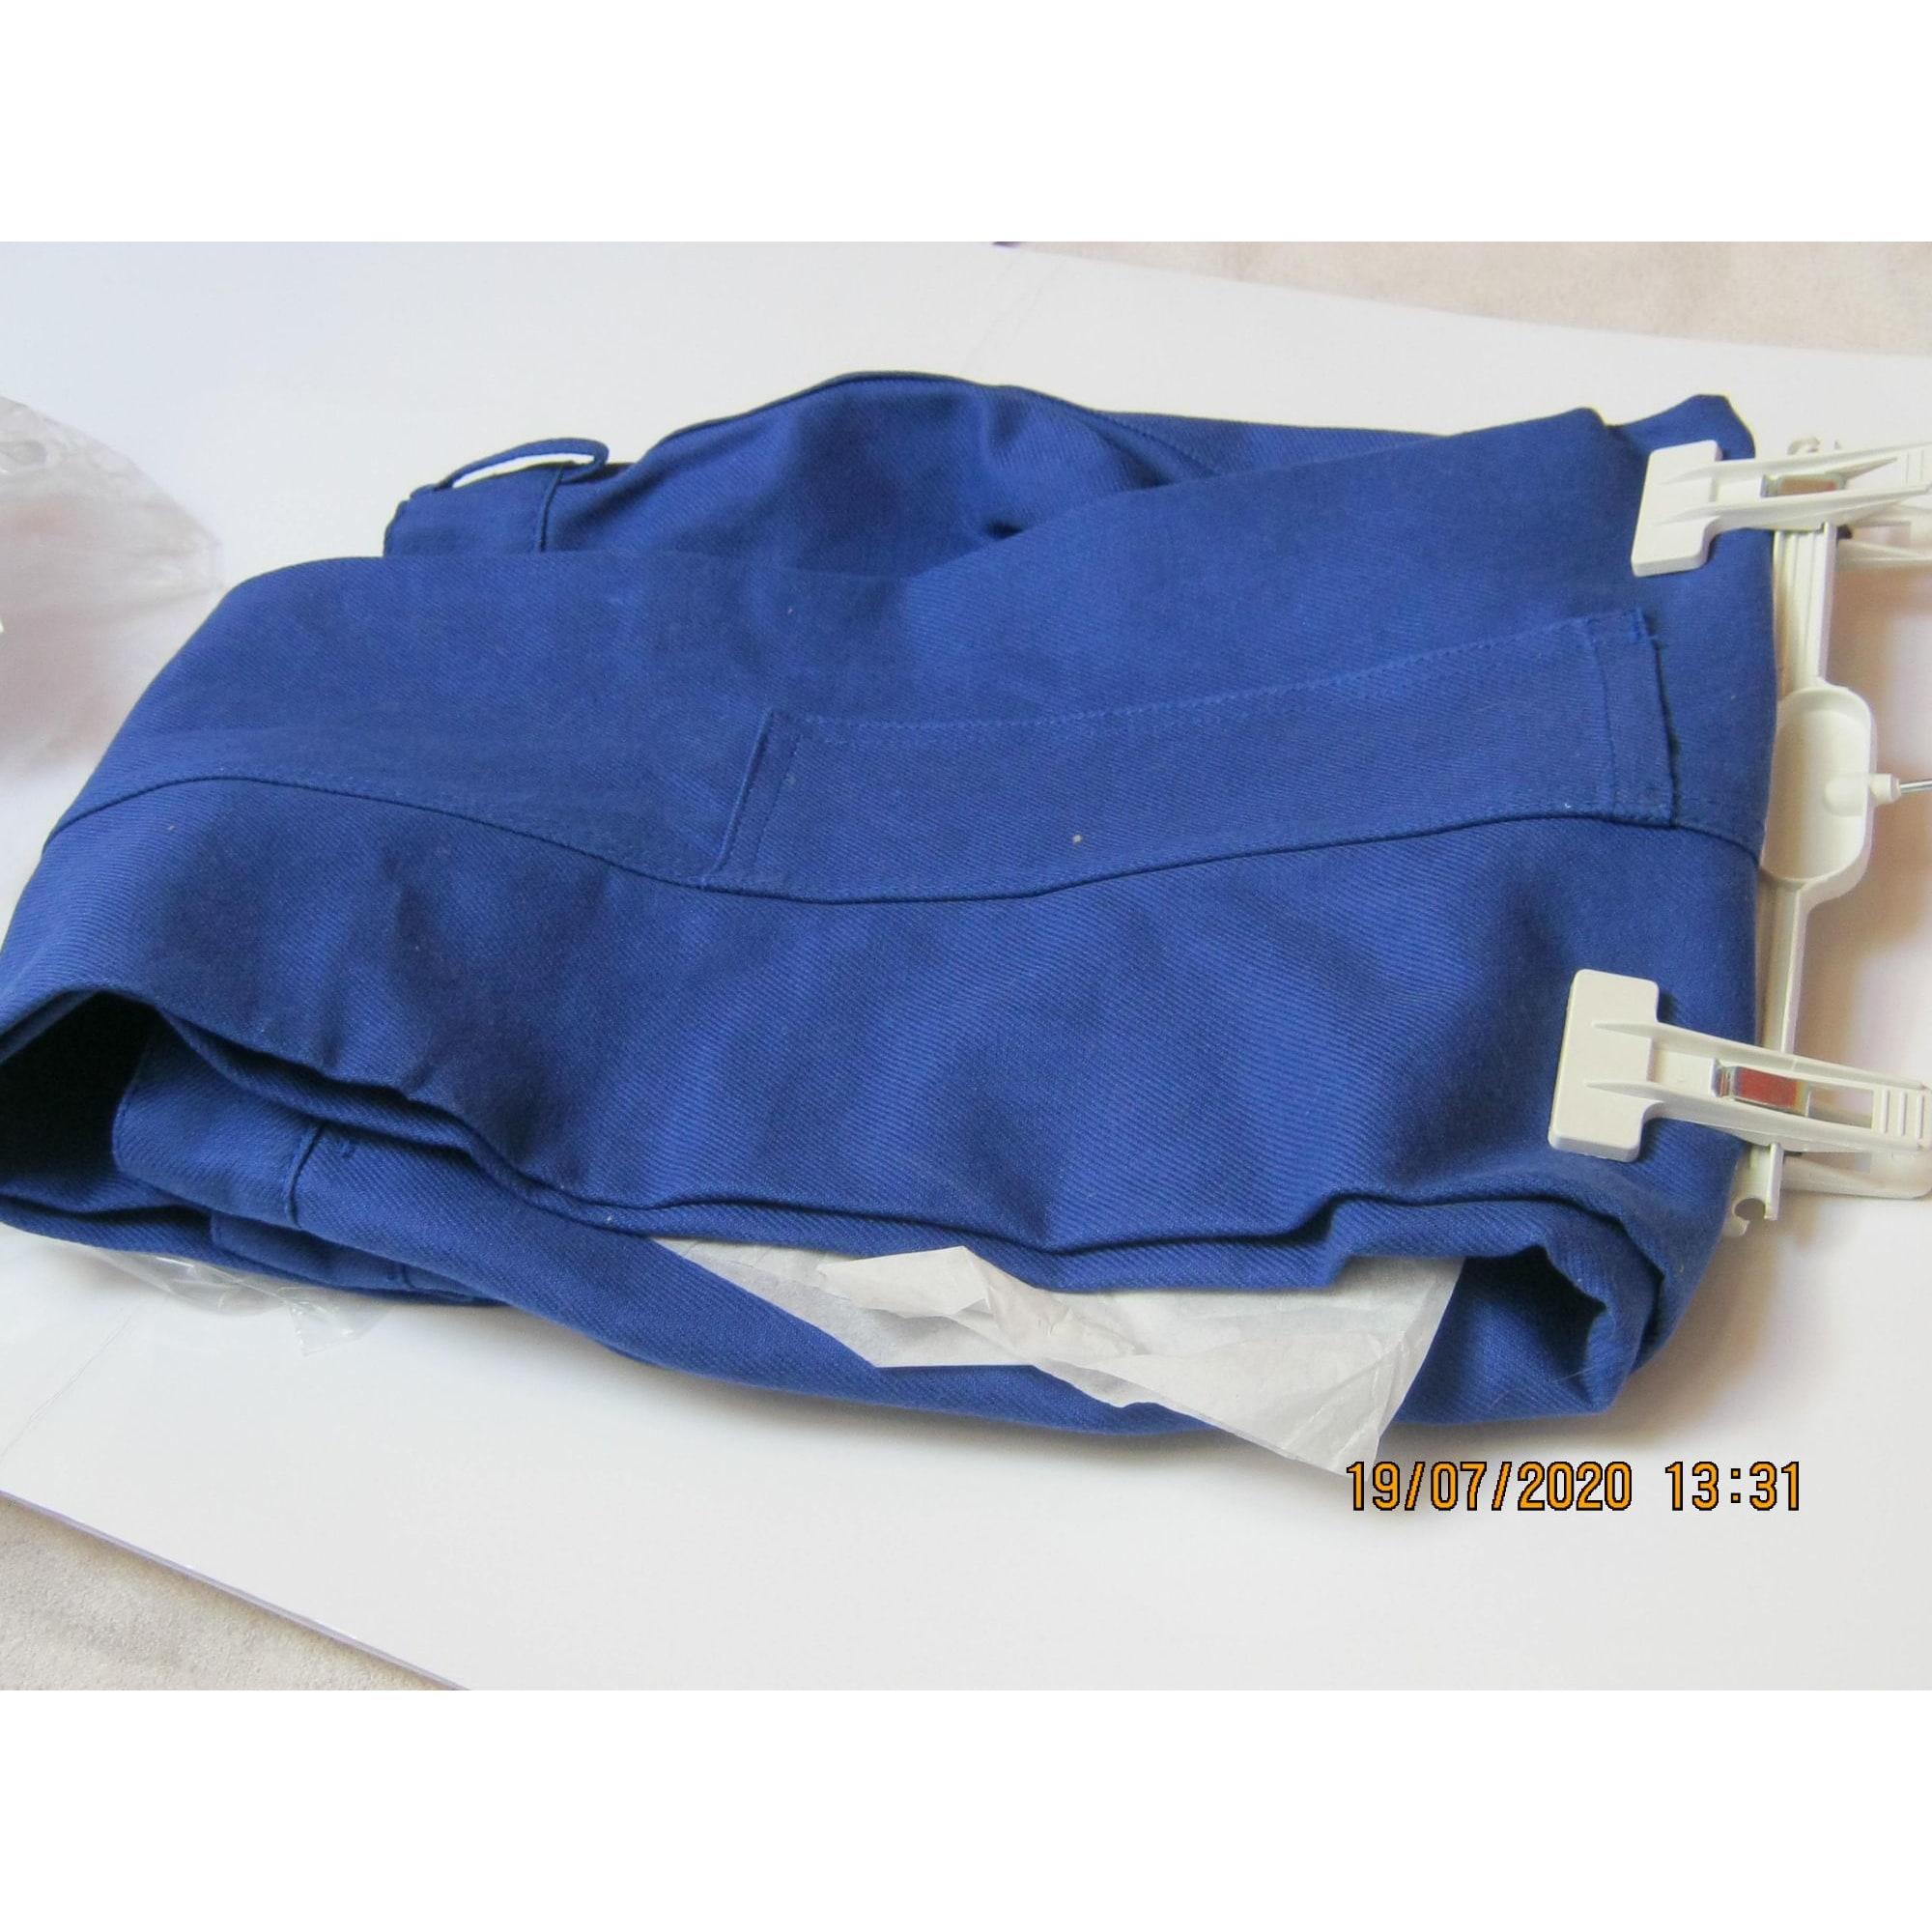 Pantalon droit PORTEX Bleu, bleu marine, bleu turquoise